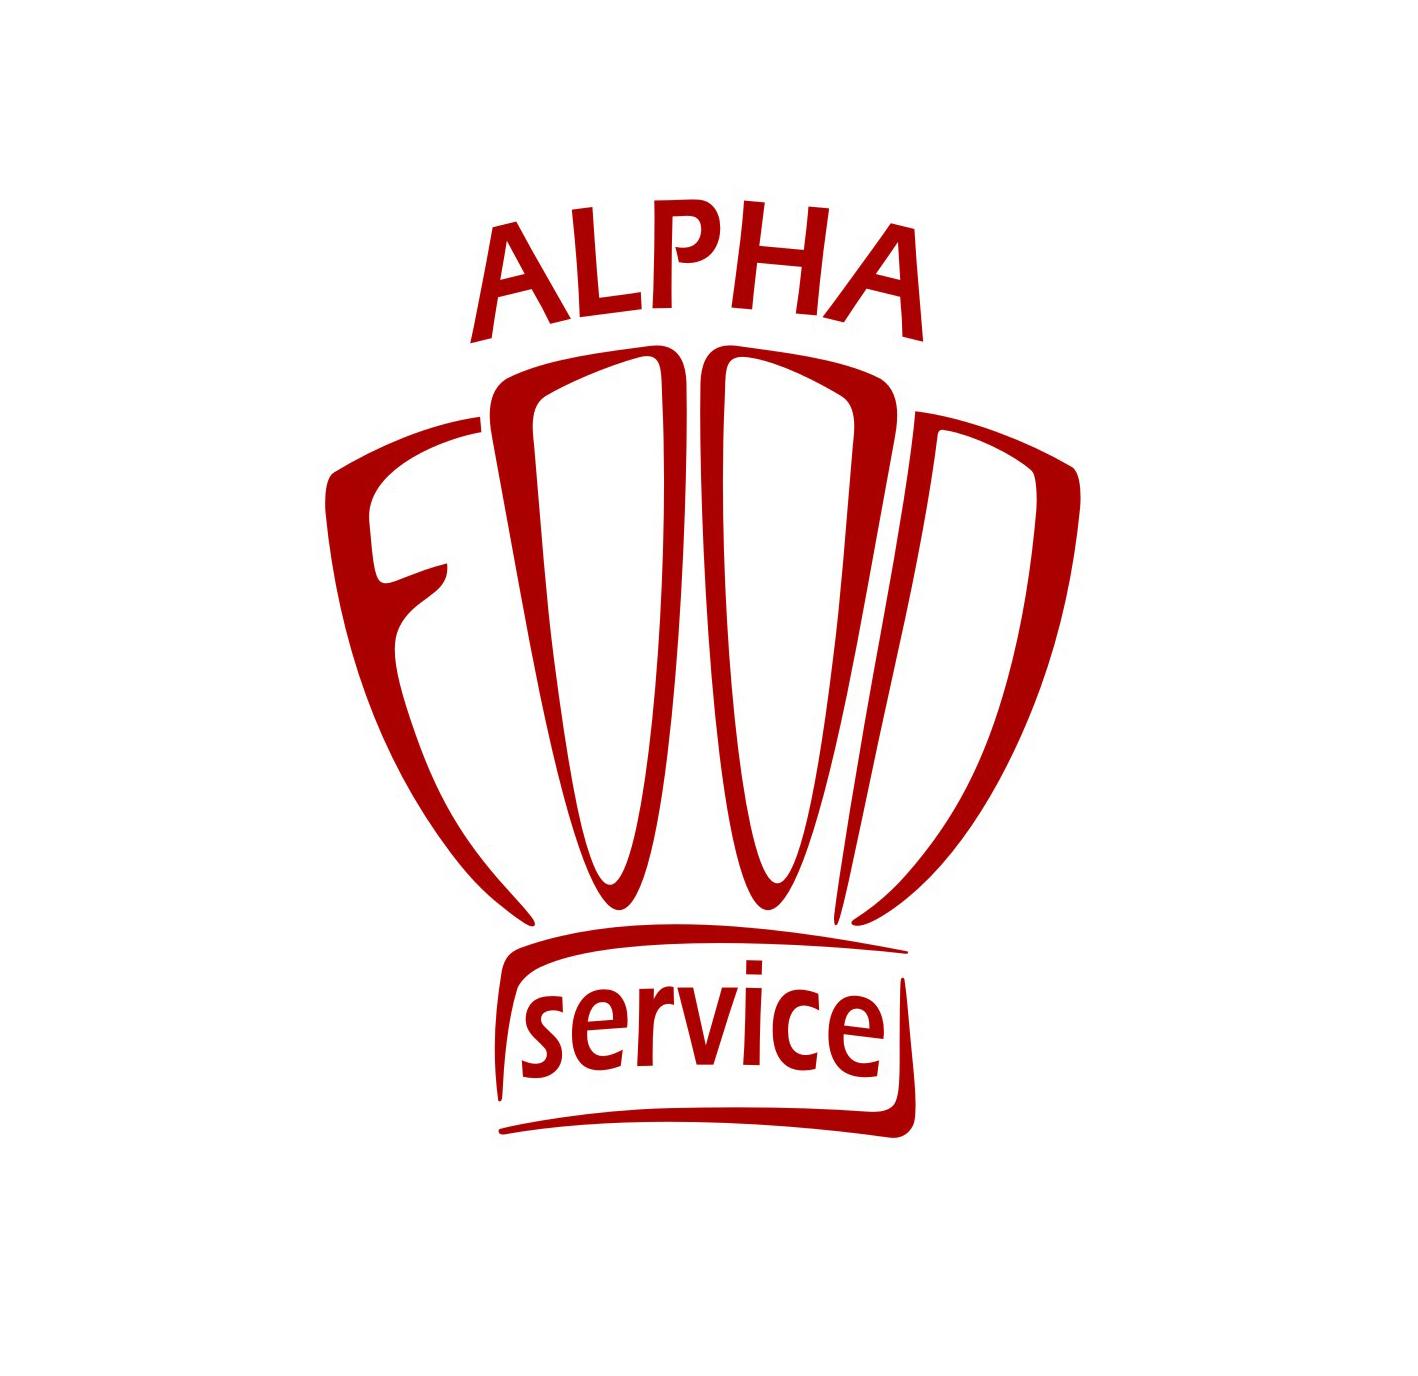 ALPHA-FOOD-SERVICE-LOGO-12